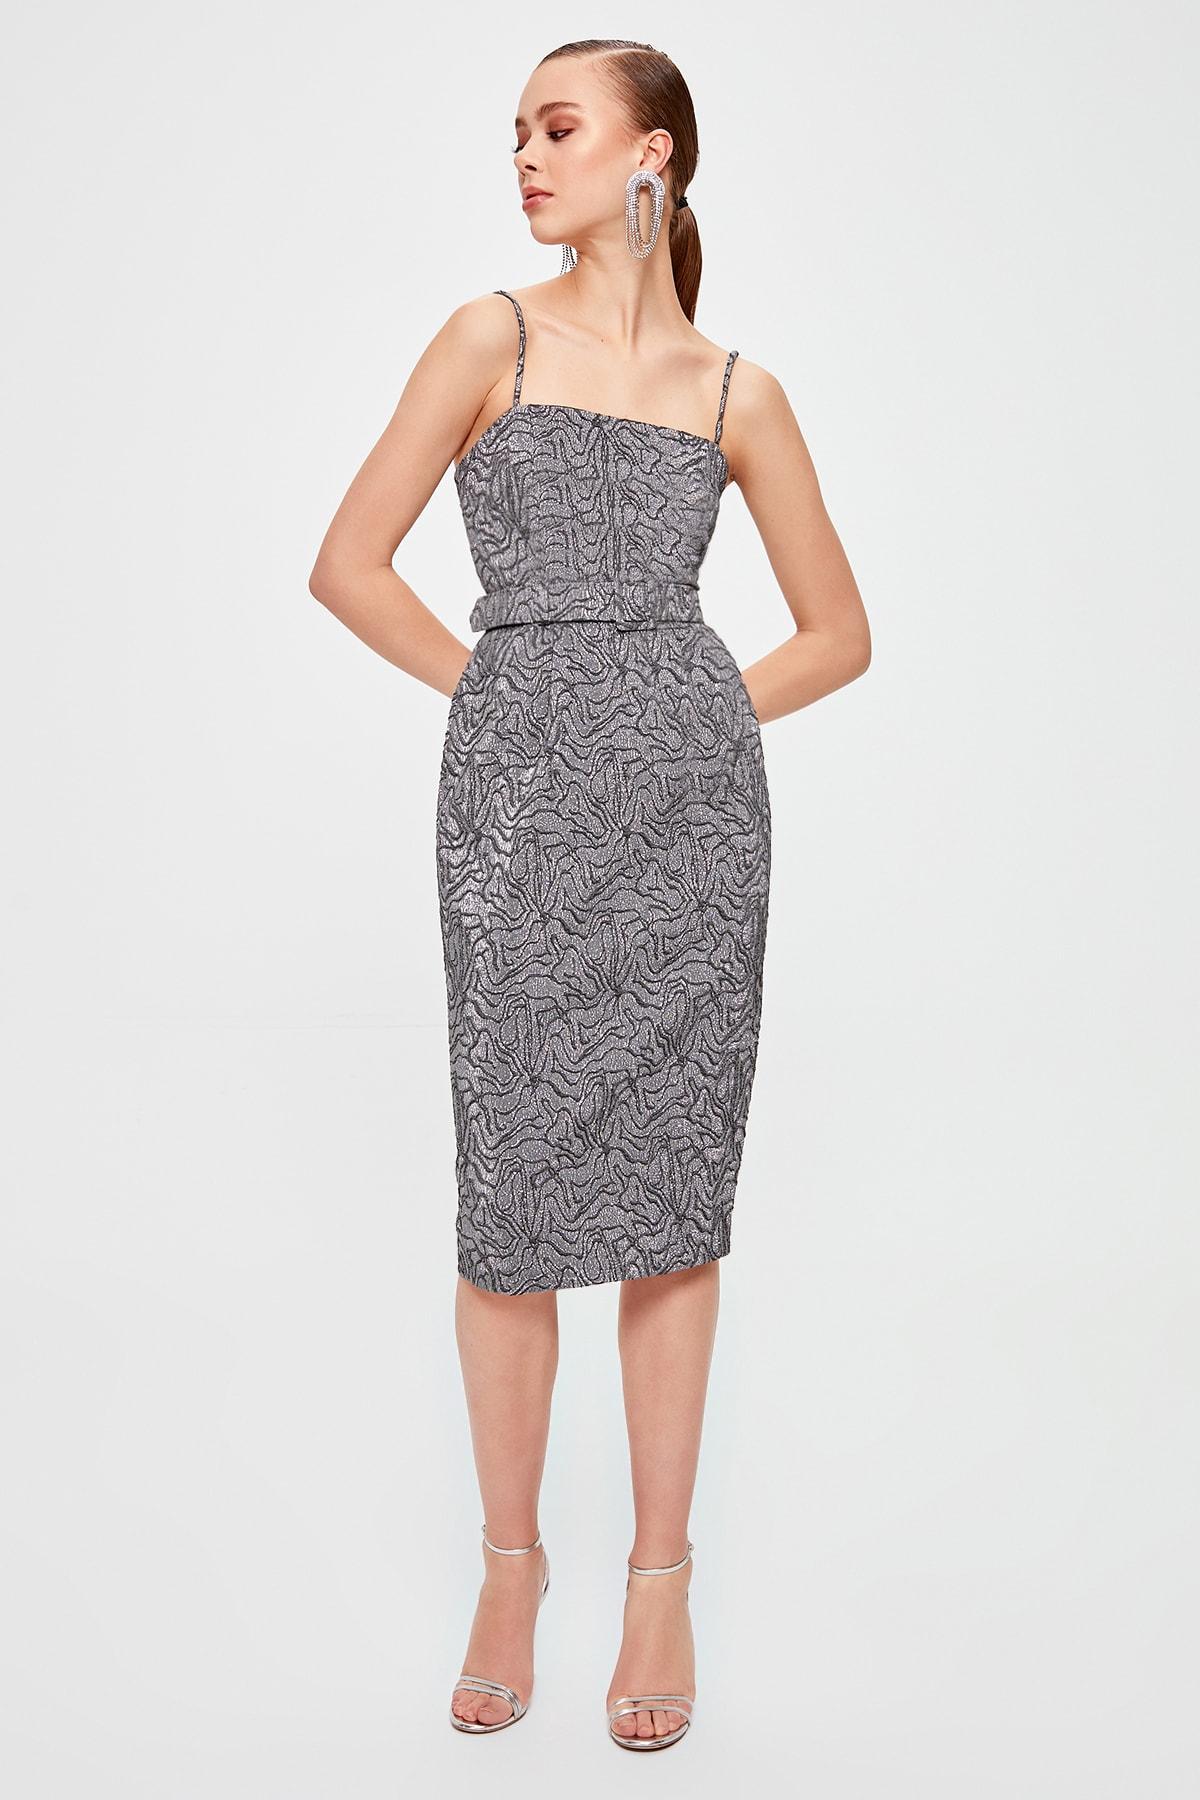 Trendyol Jacquard Patterned Dress TPRSS20EL0051